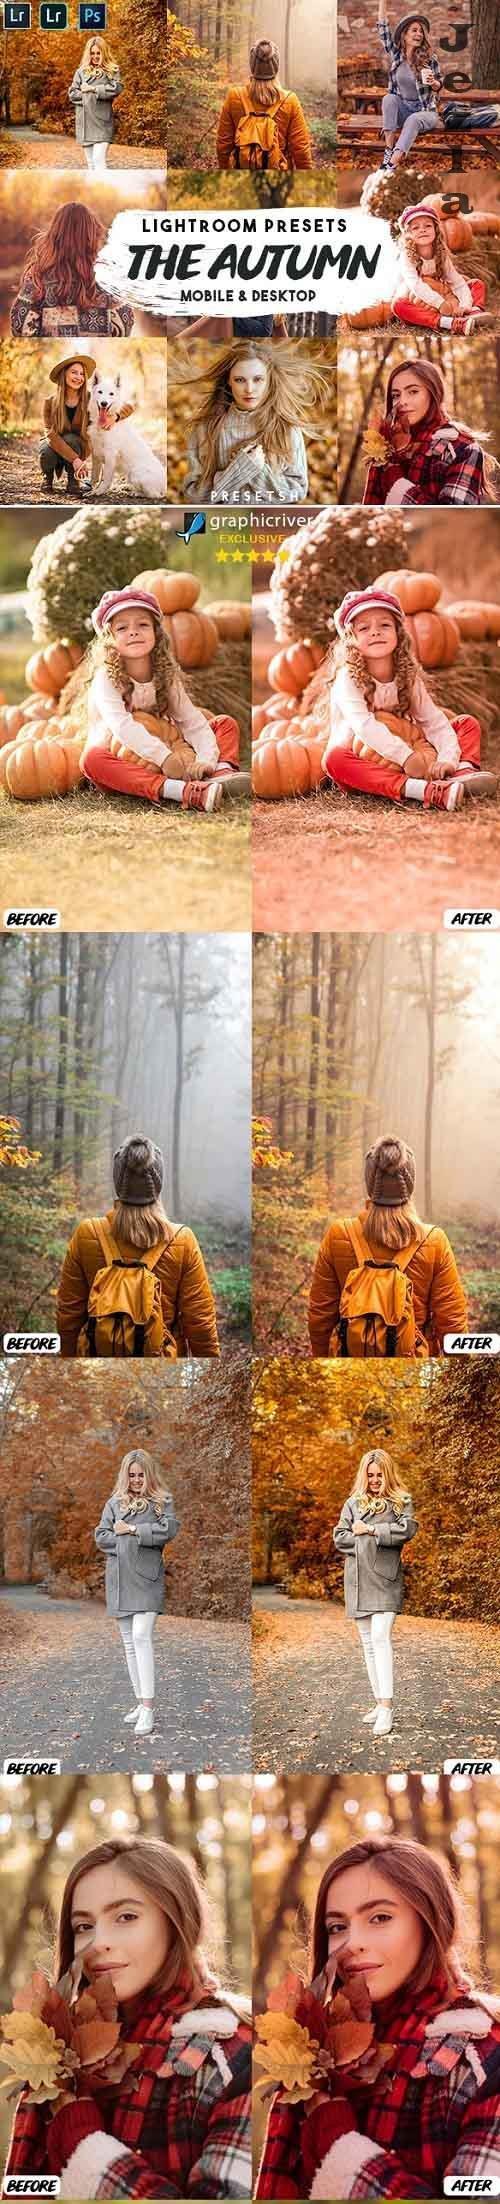 CreativeMarket - The Autumn Lightroom Presets 5506478